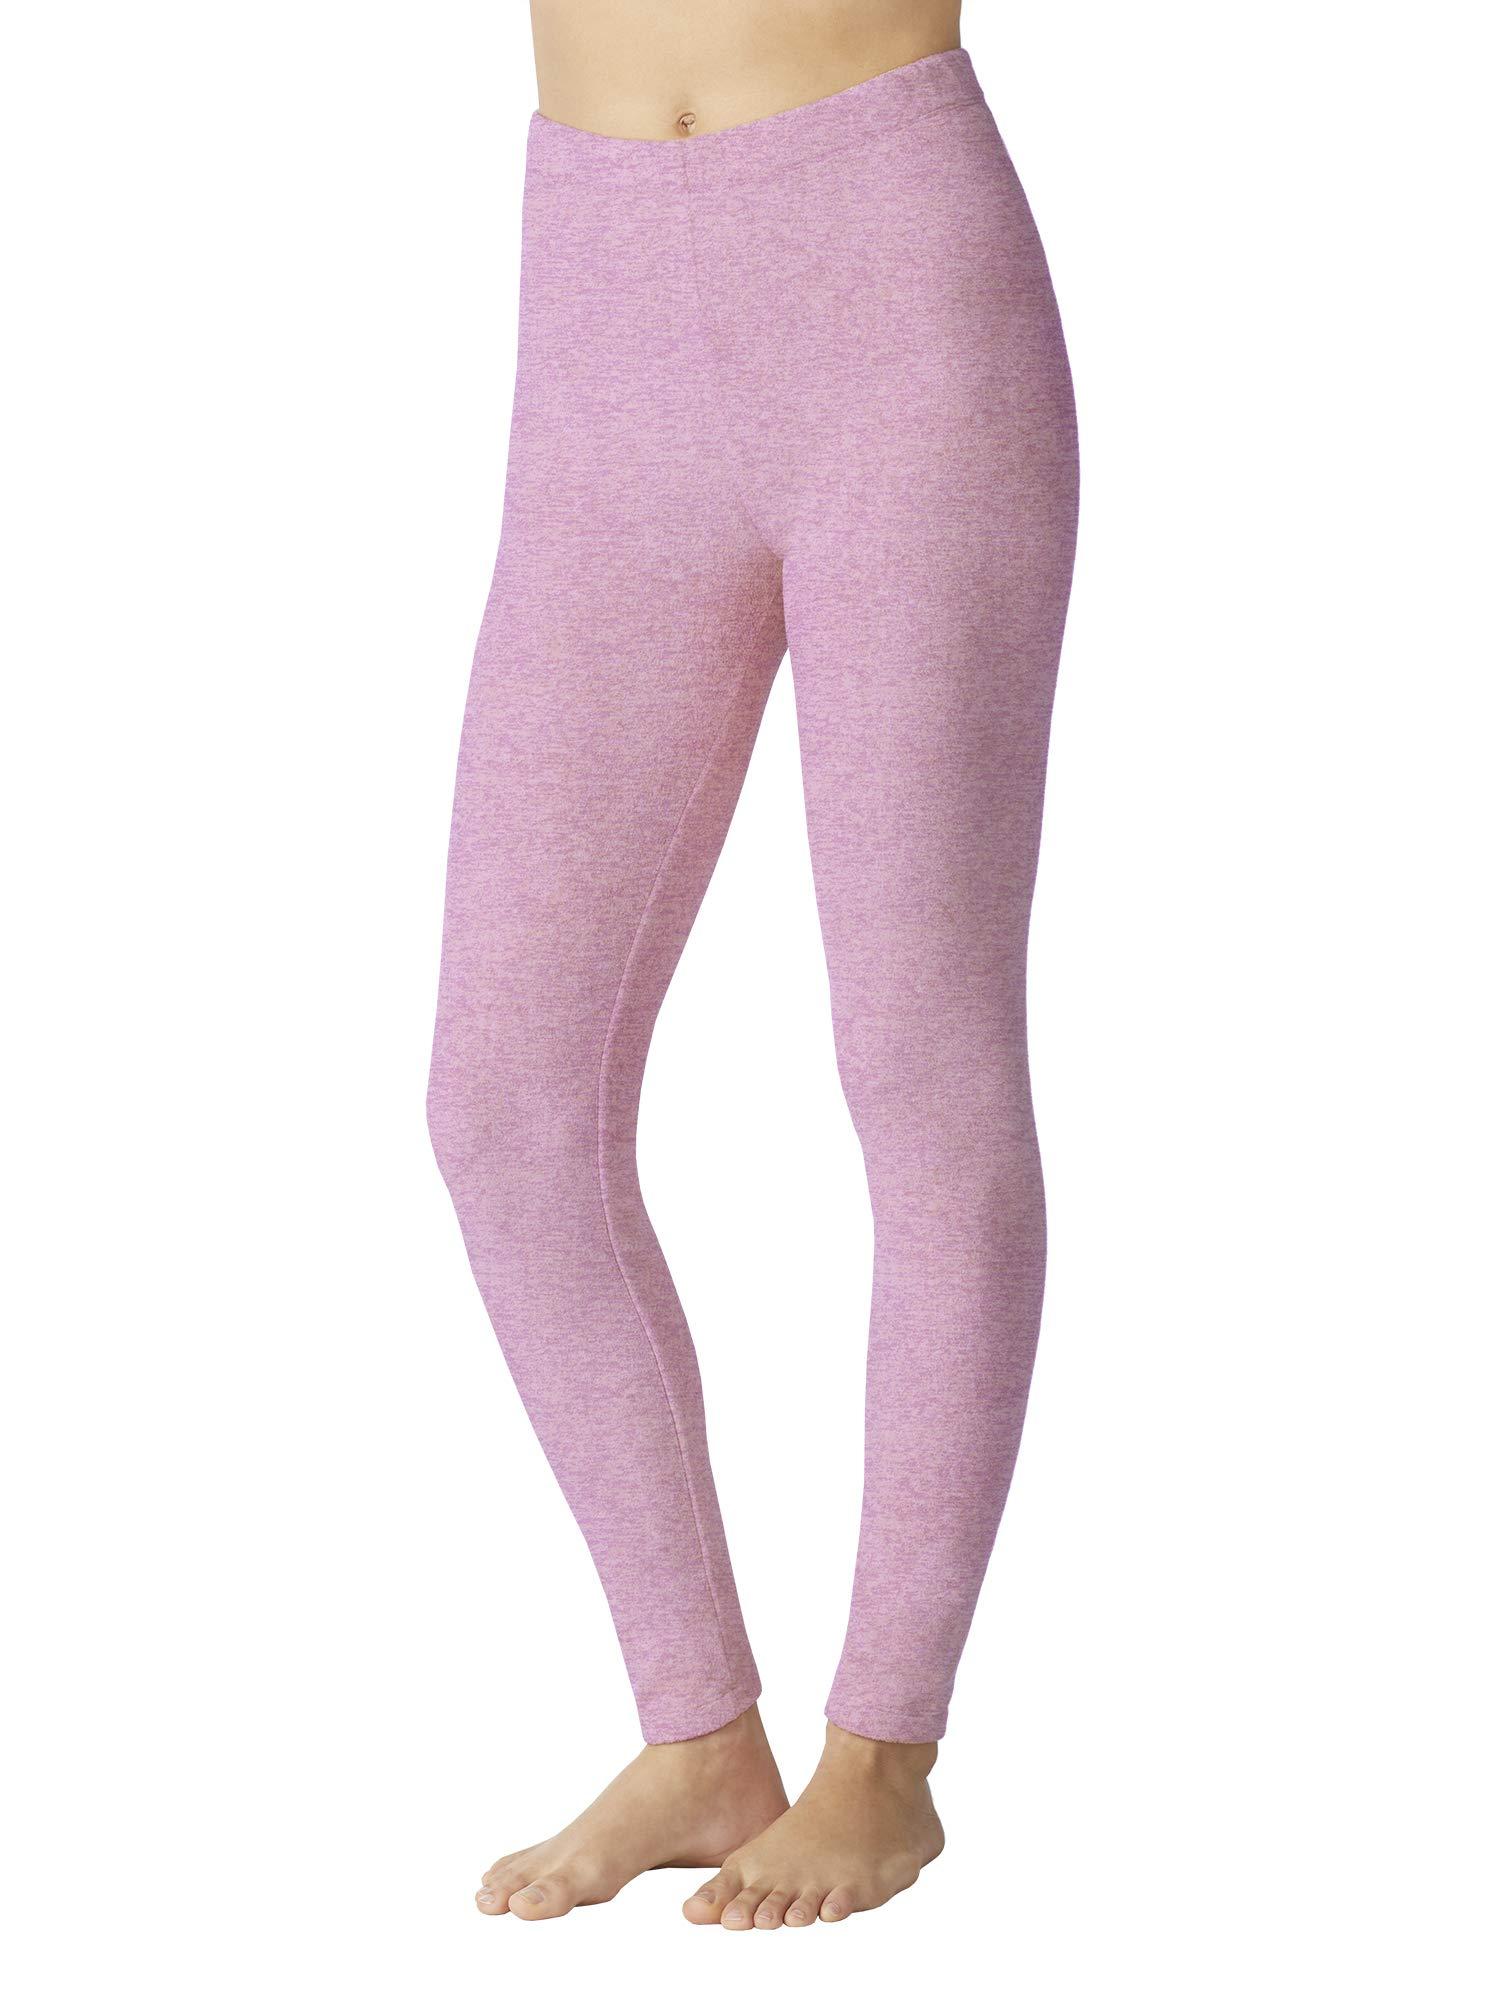 Cuddl Duds ClimateRight Stretch Fleece Warm Underwear Legging XL, Black With Subtle Embossing